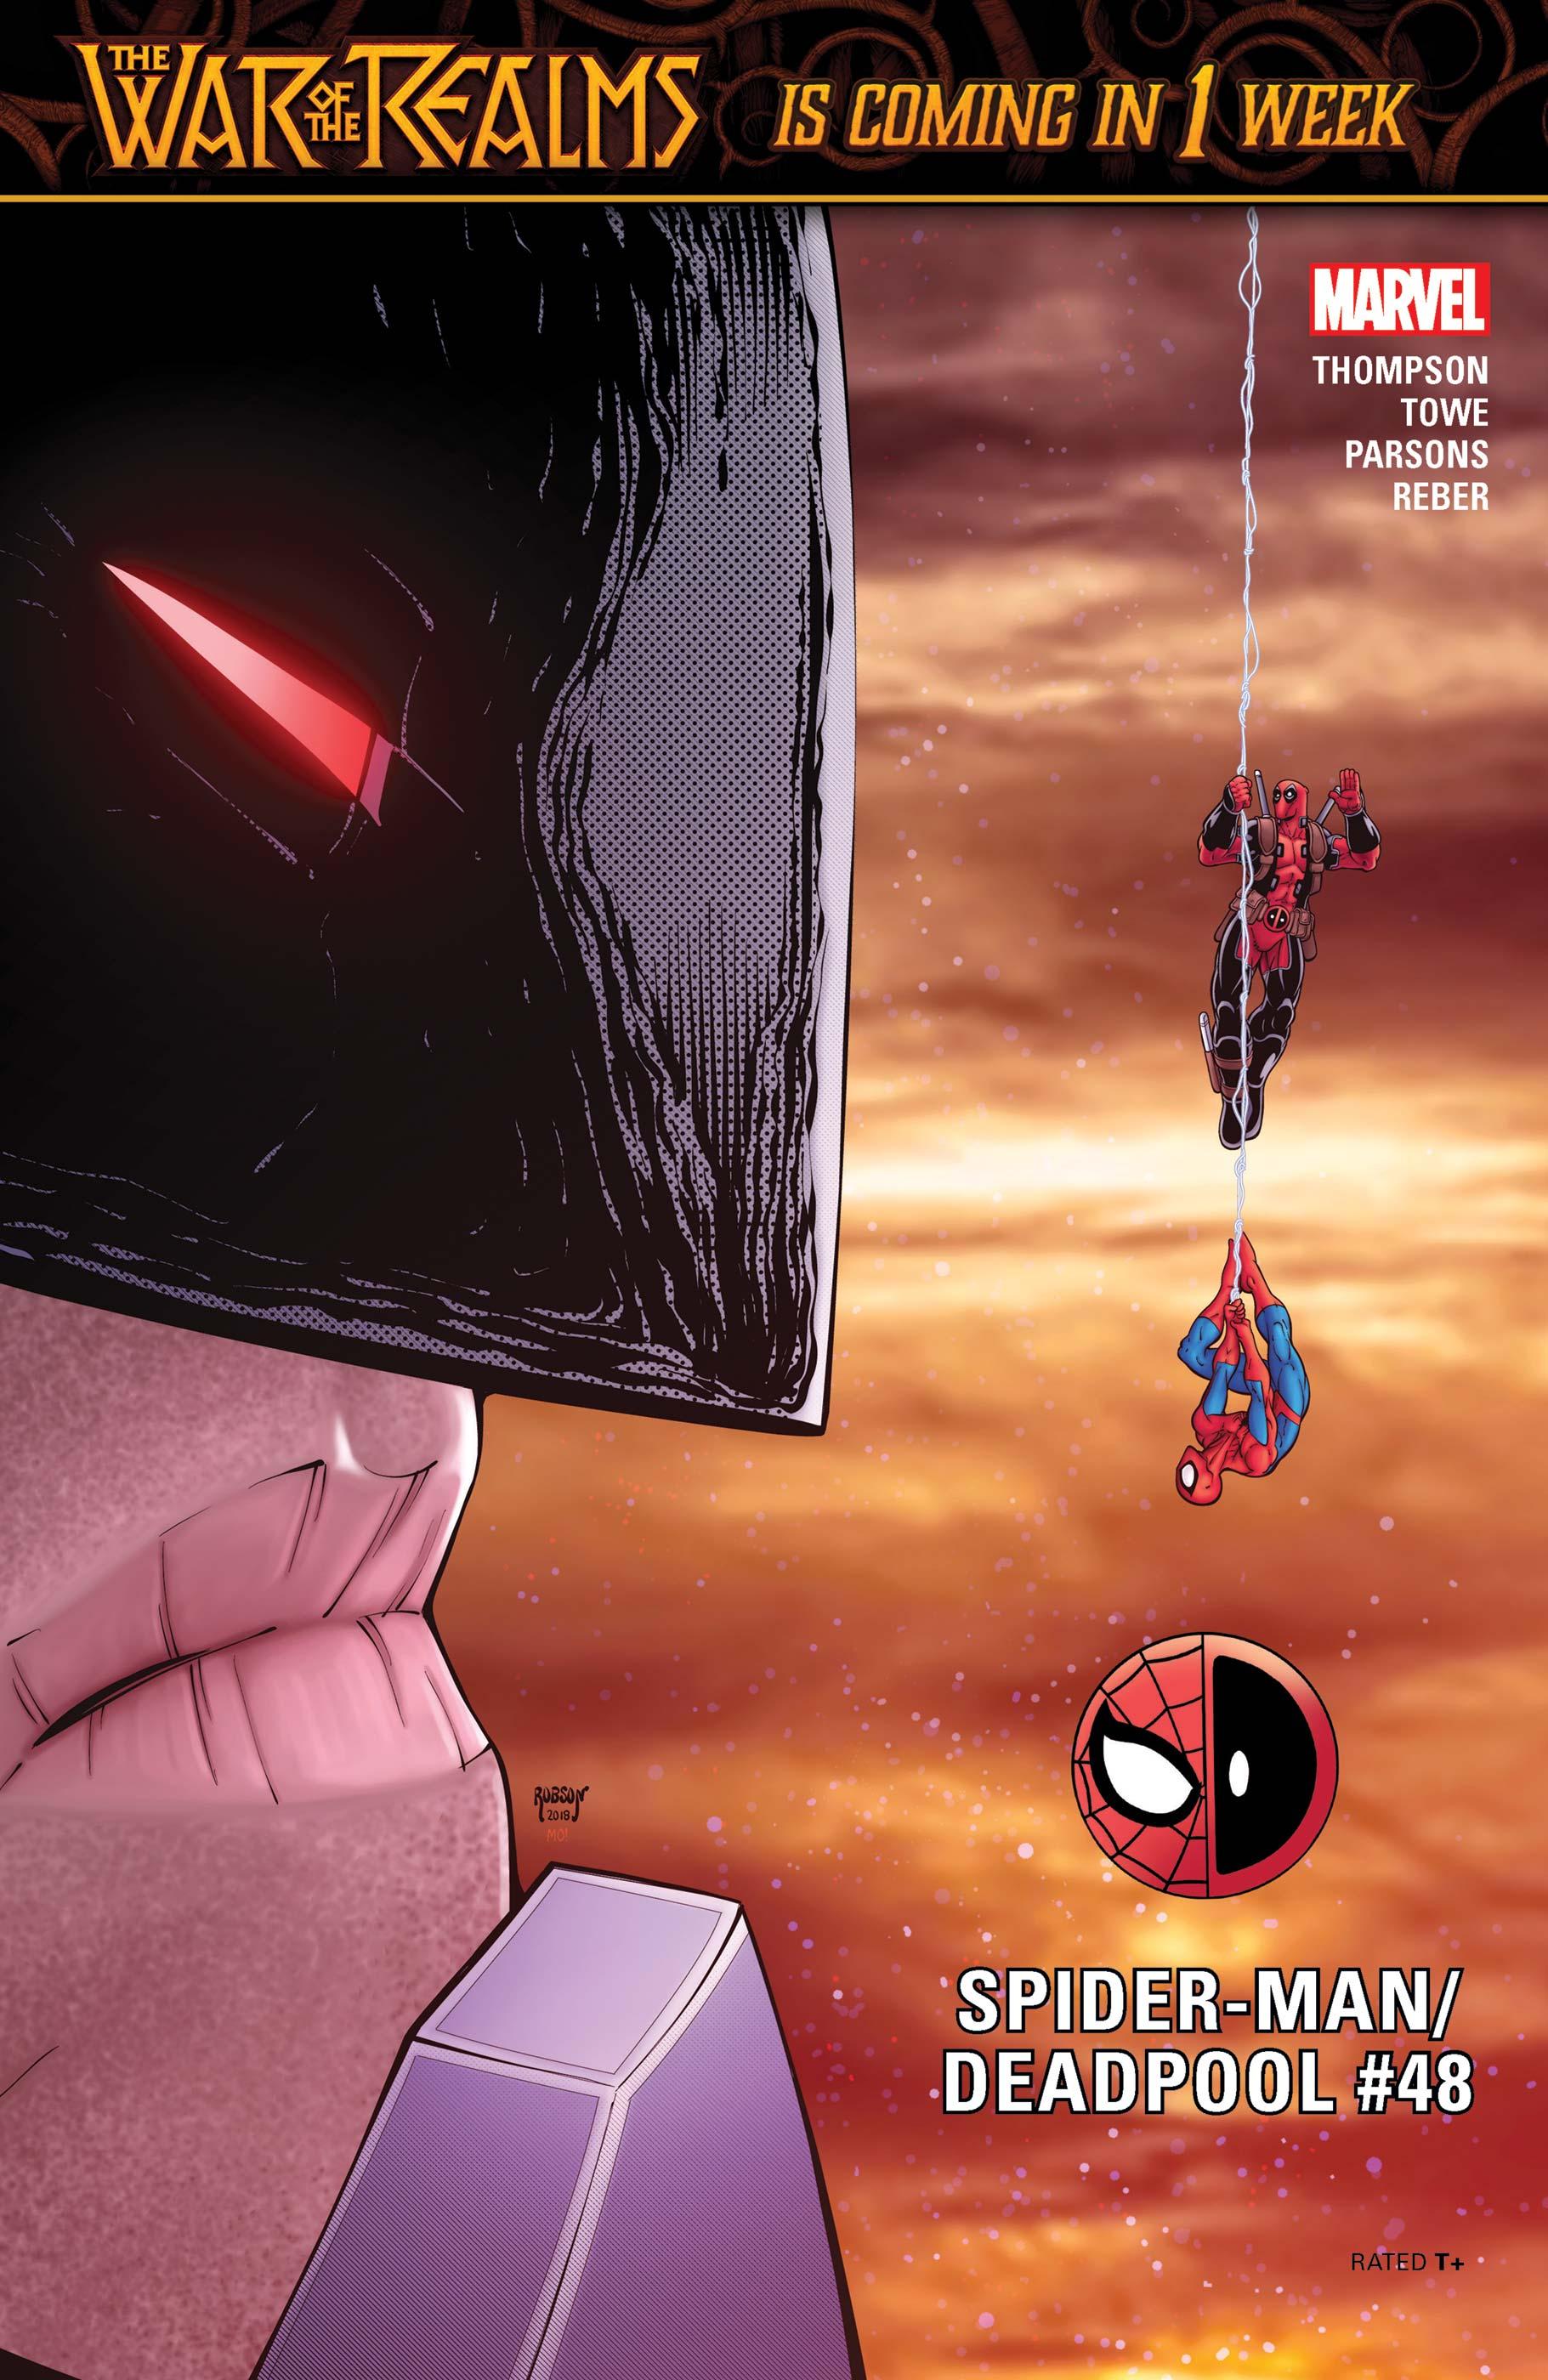 Spider-Man/Deadpool (2016) #48